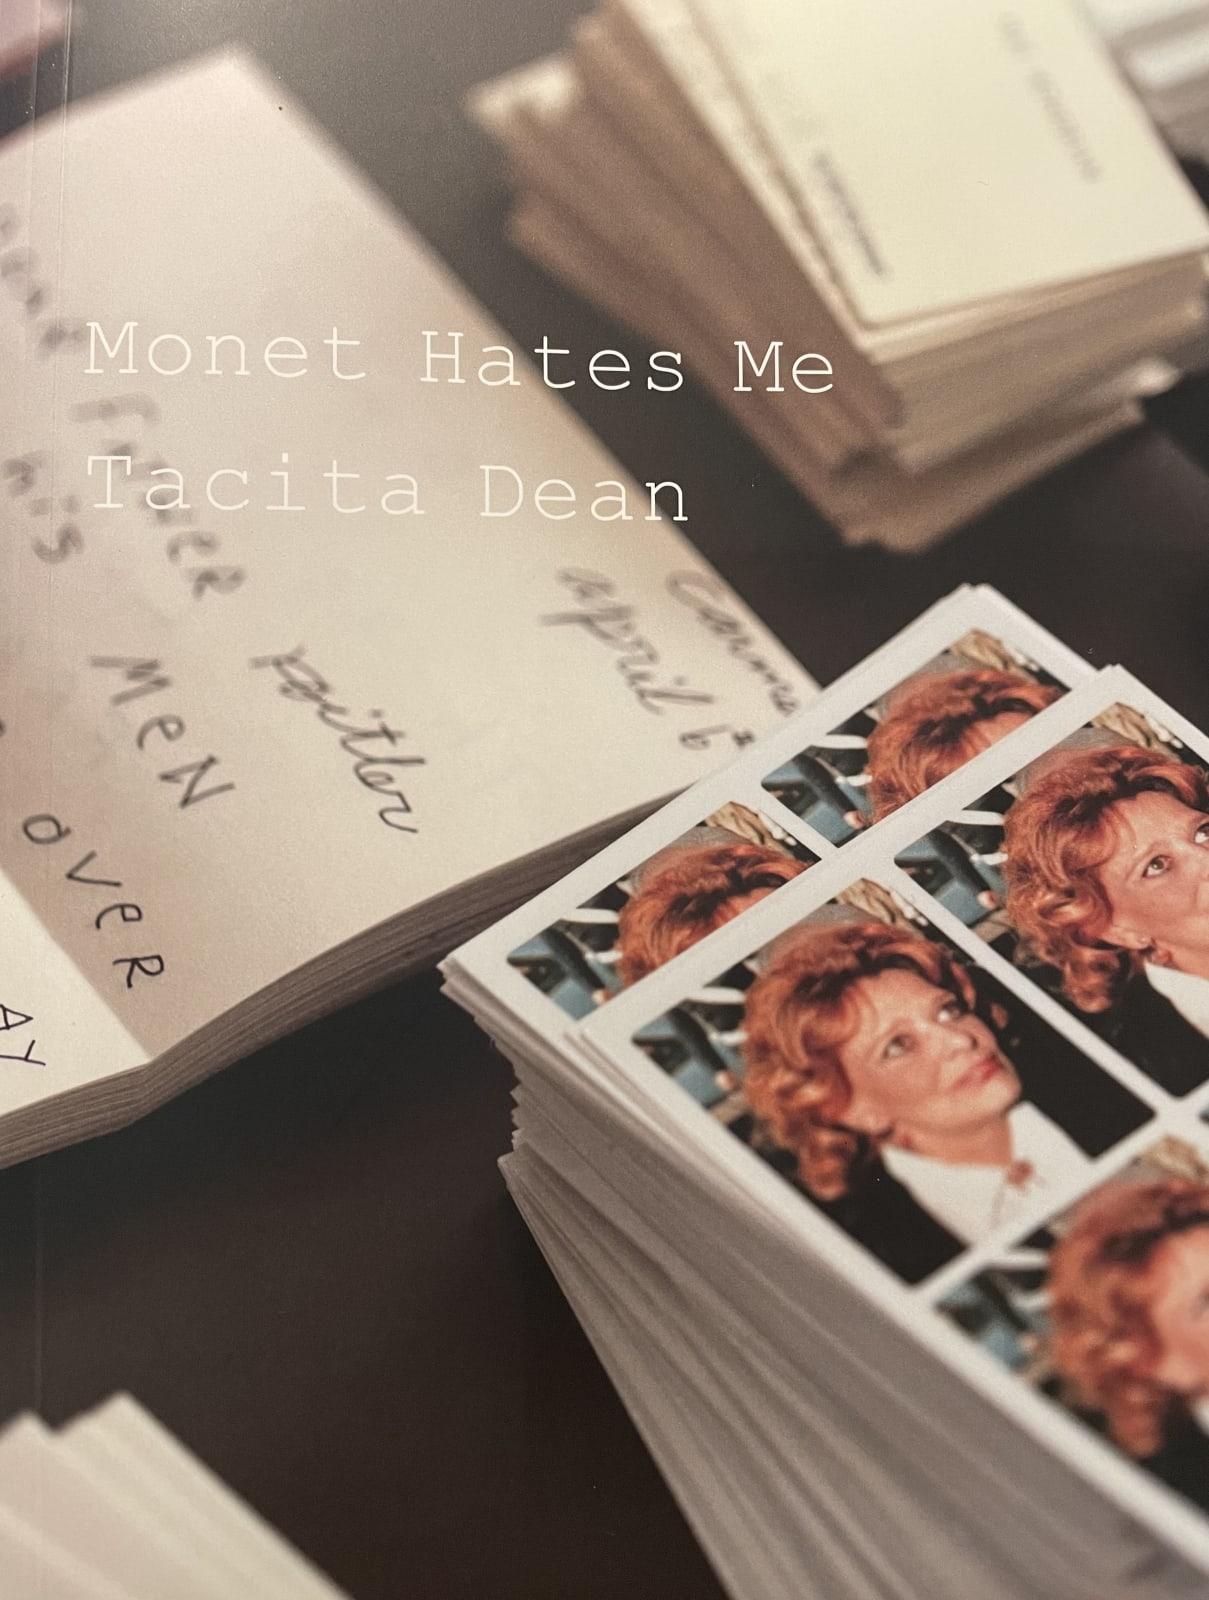 Tacita Dean Monet Hates Me